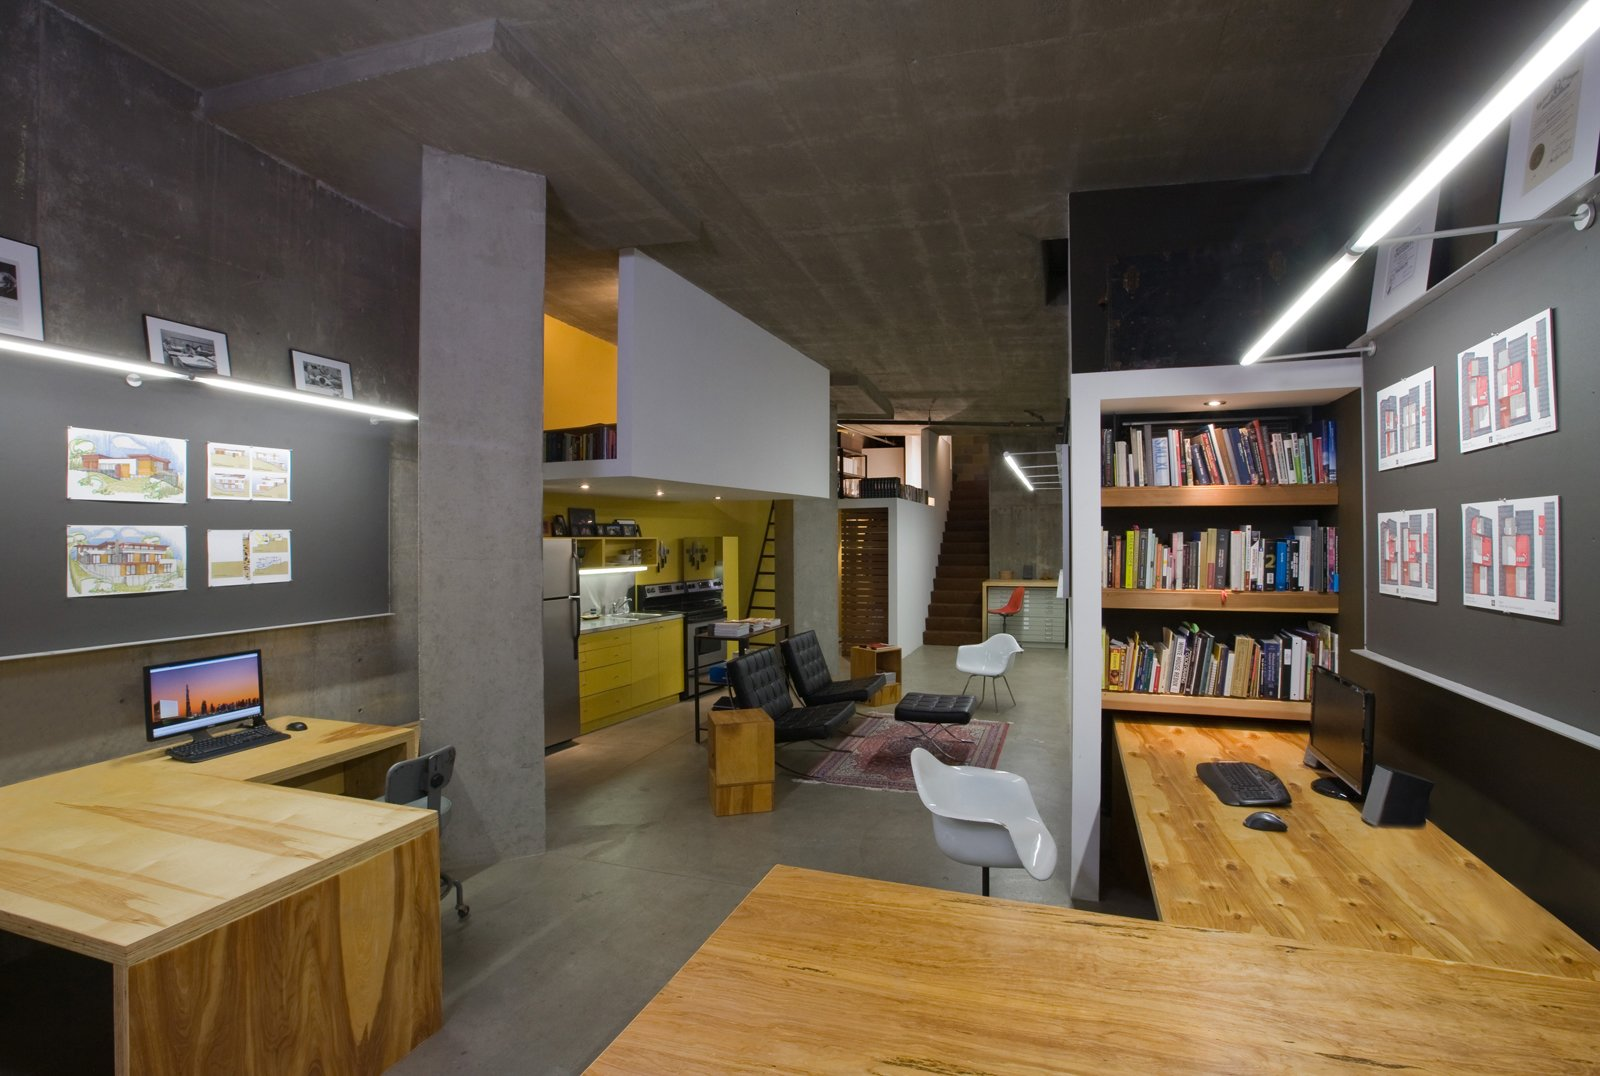 san diego cadres by erika heet dwell. Black Bedroom Furniture Sets. Home Design Ideas